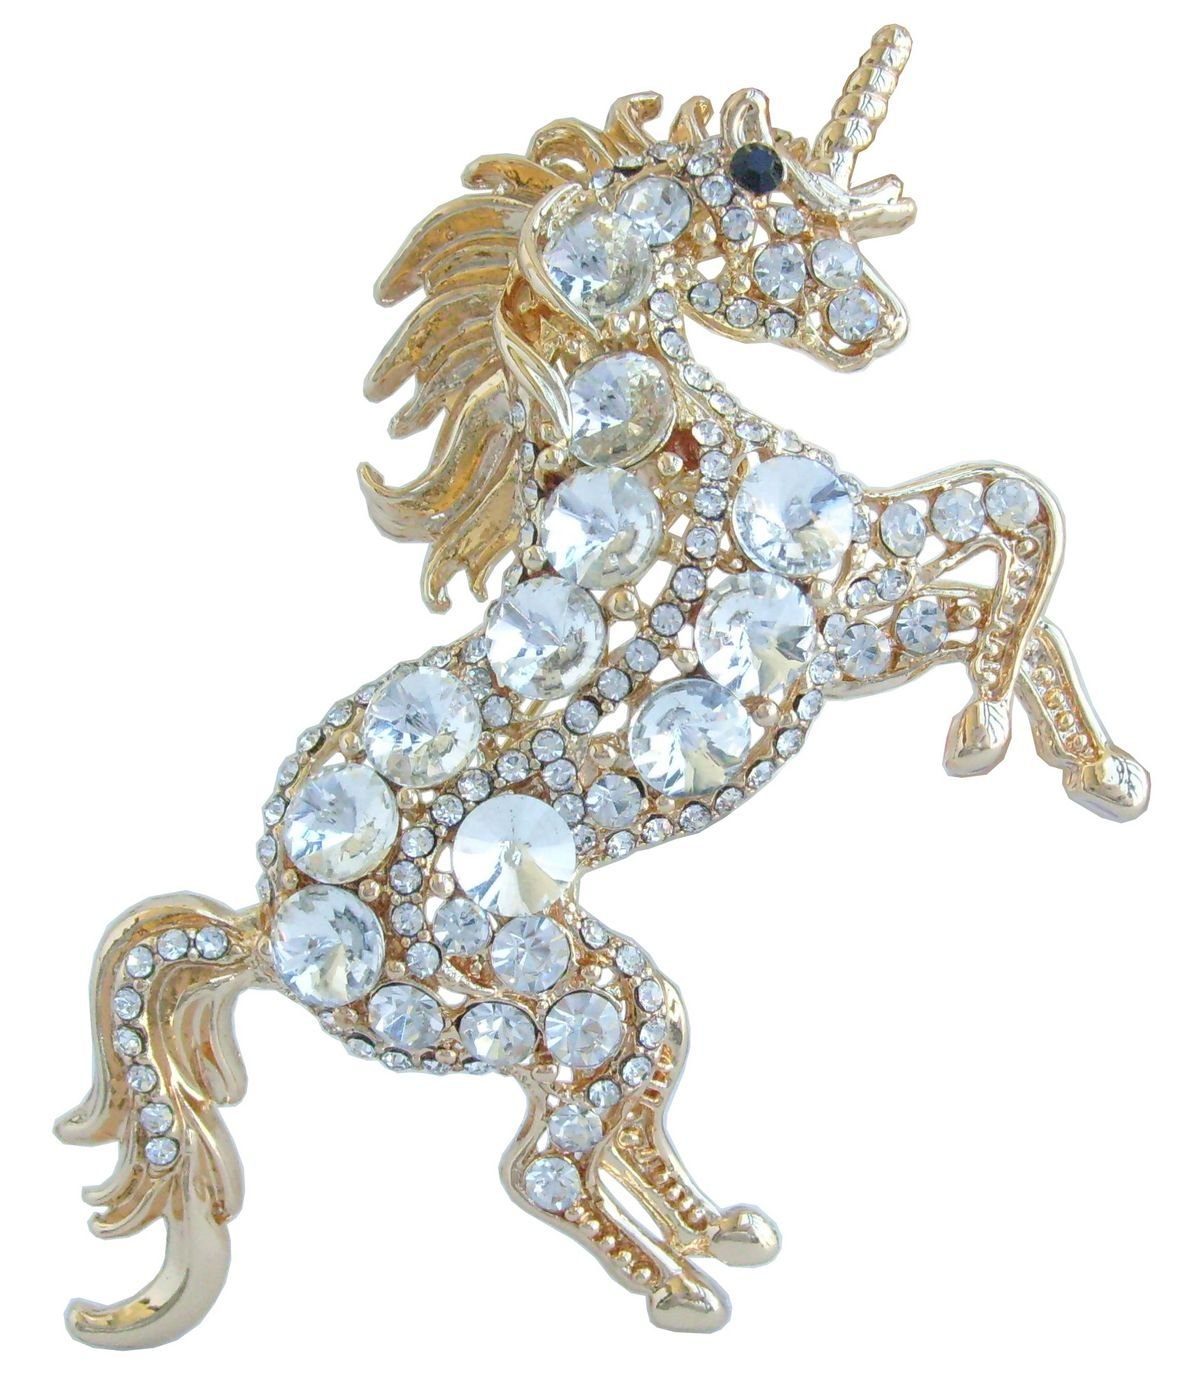 Sindary Unique Animal Unicorn Horse Brooch Pin Pendant Austrian Crystal BZ6172 (Gold-Tone Clear)